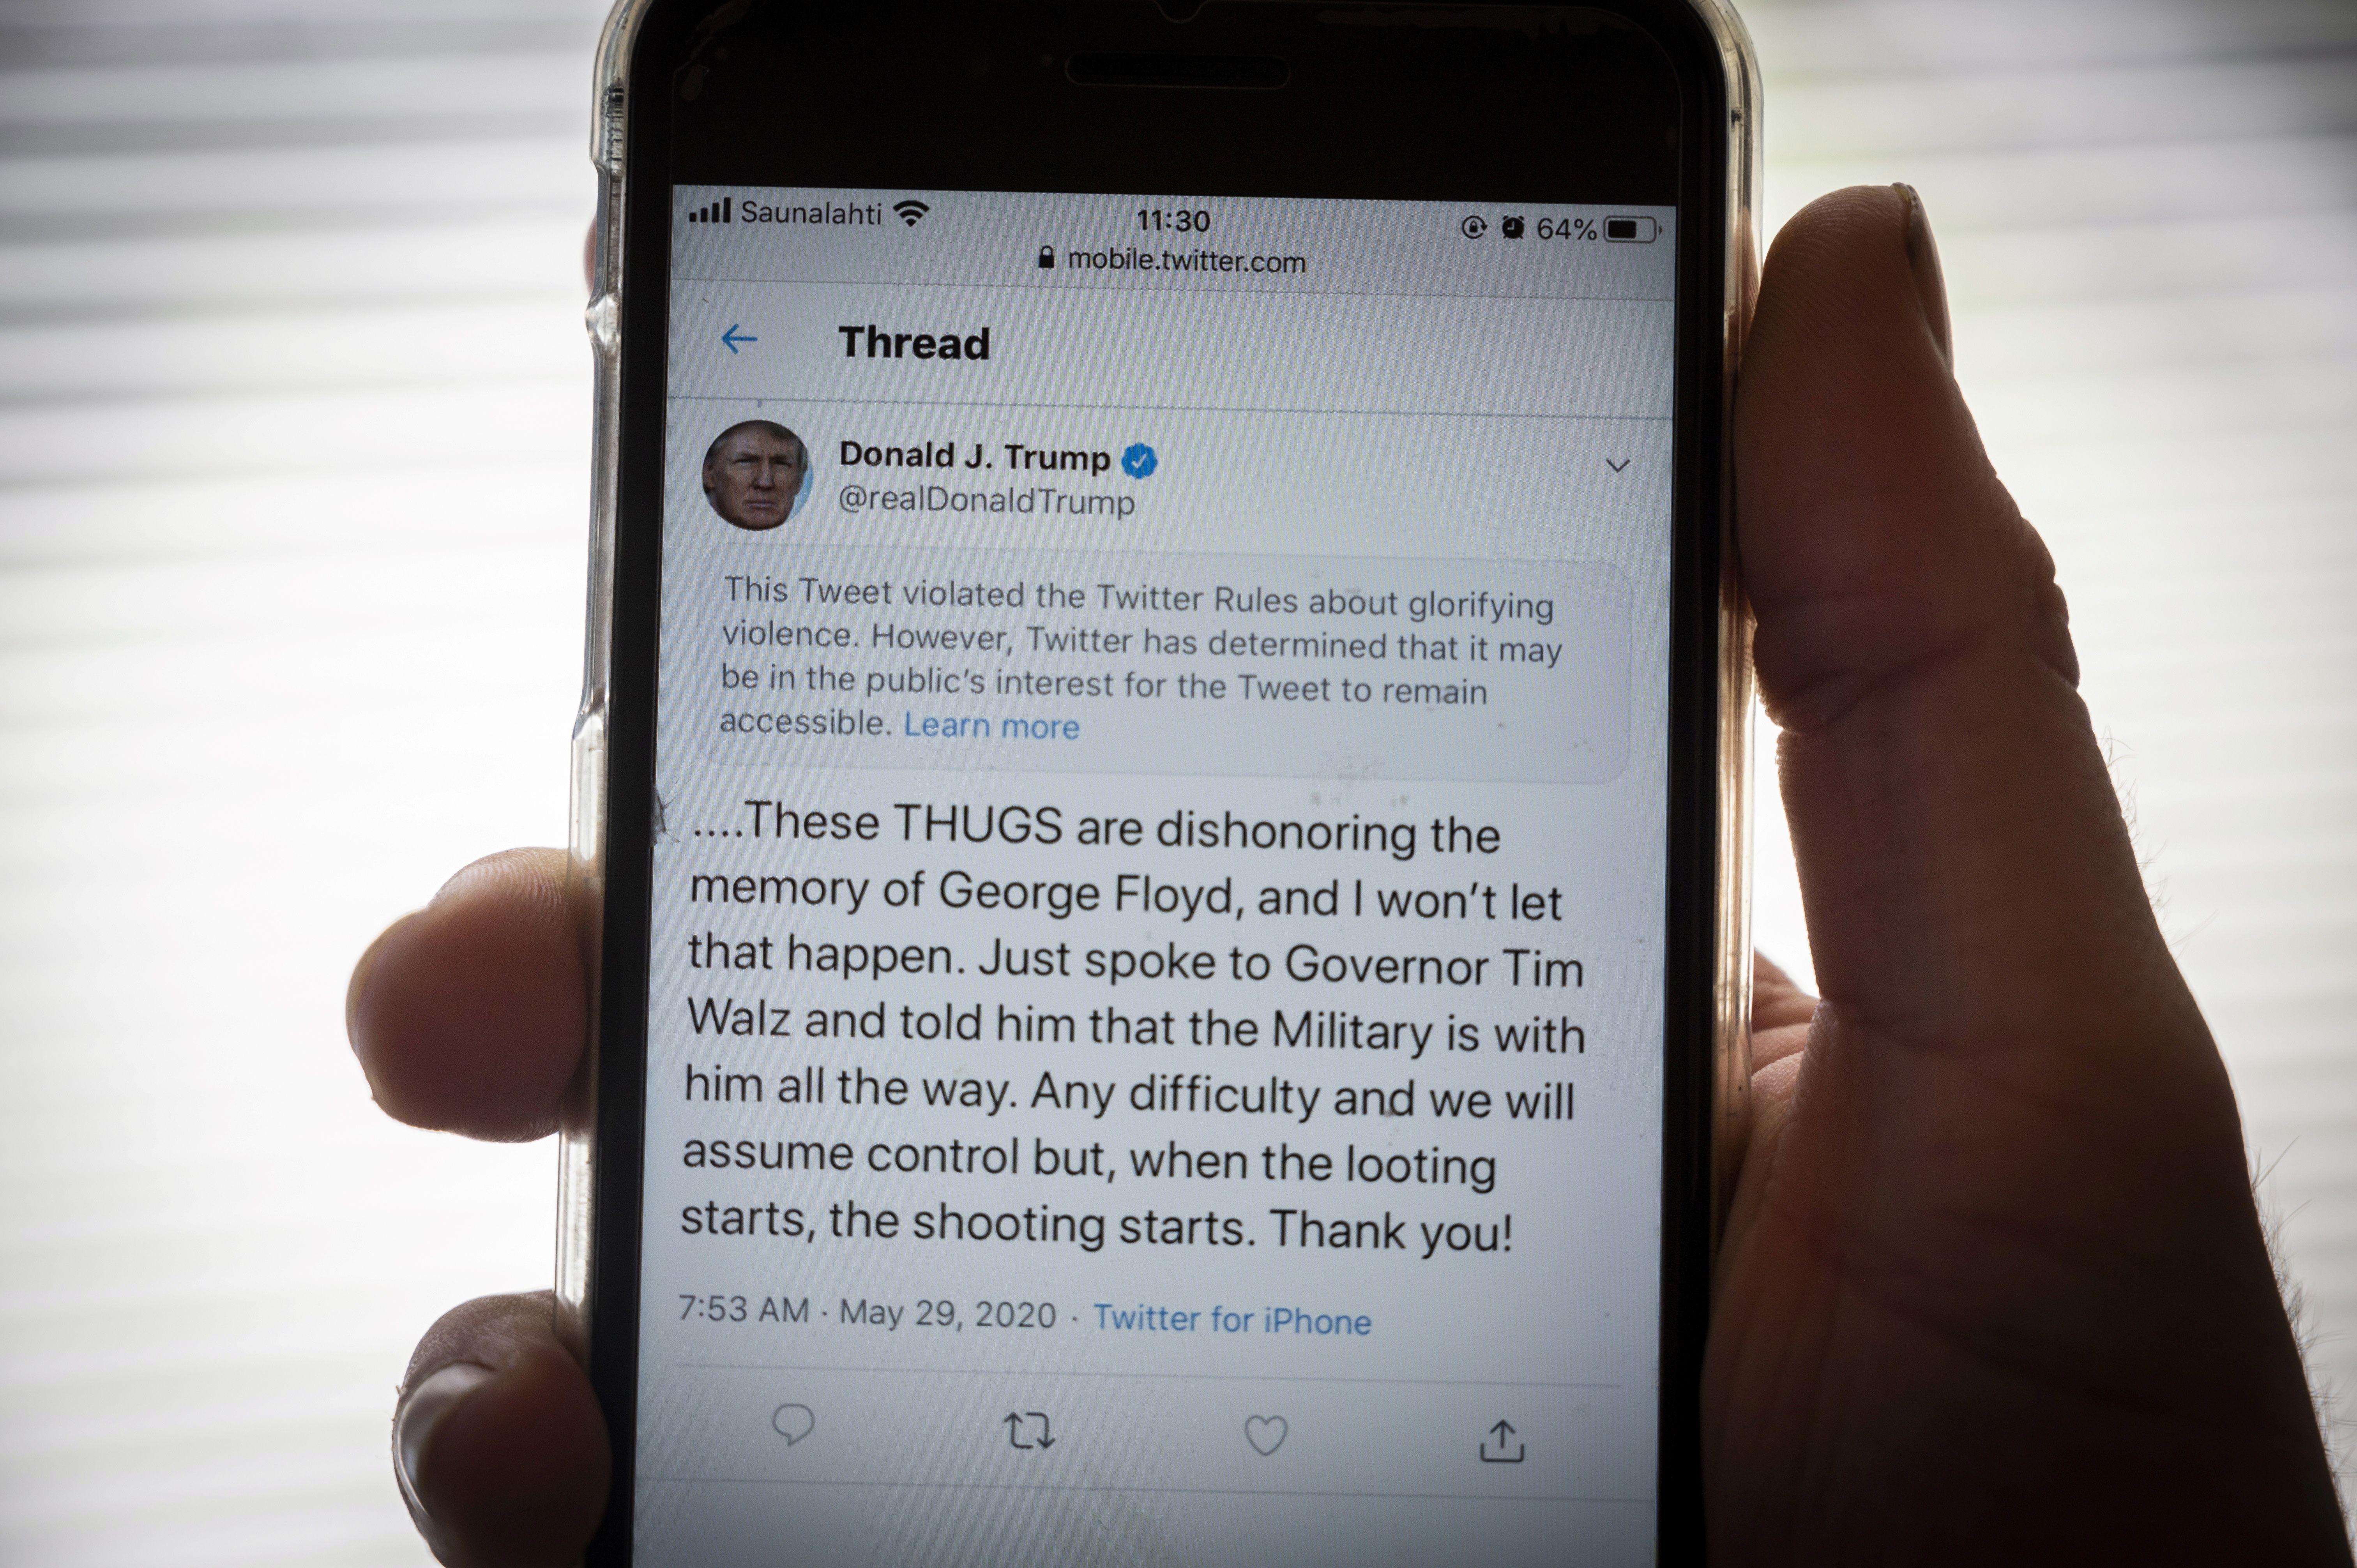 McDonalds Tweet Blasts President Trump, And Is Quickly